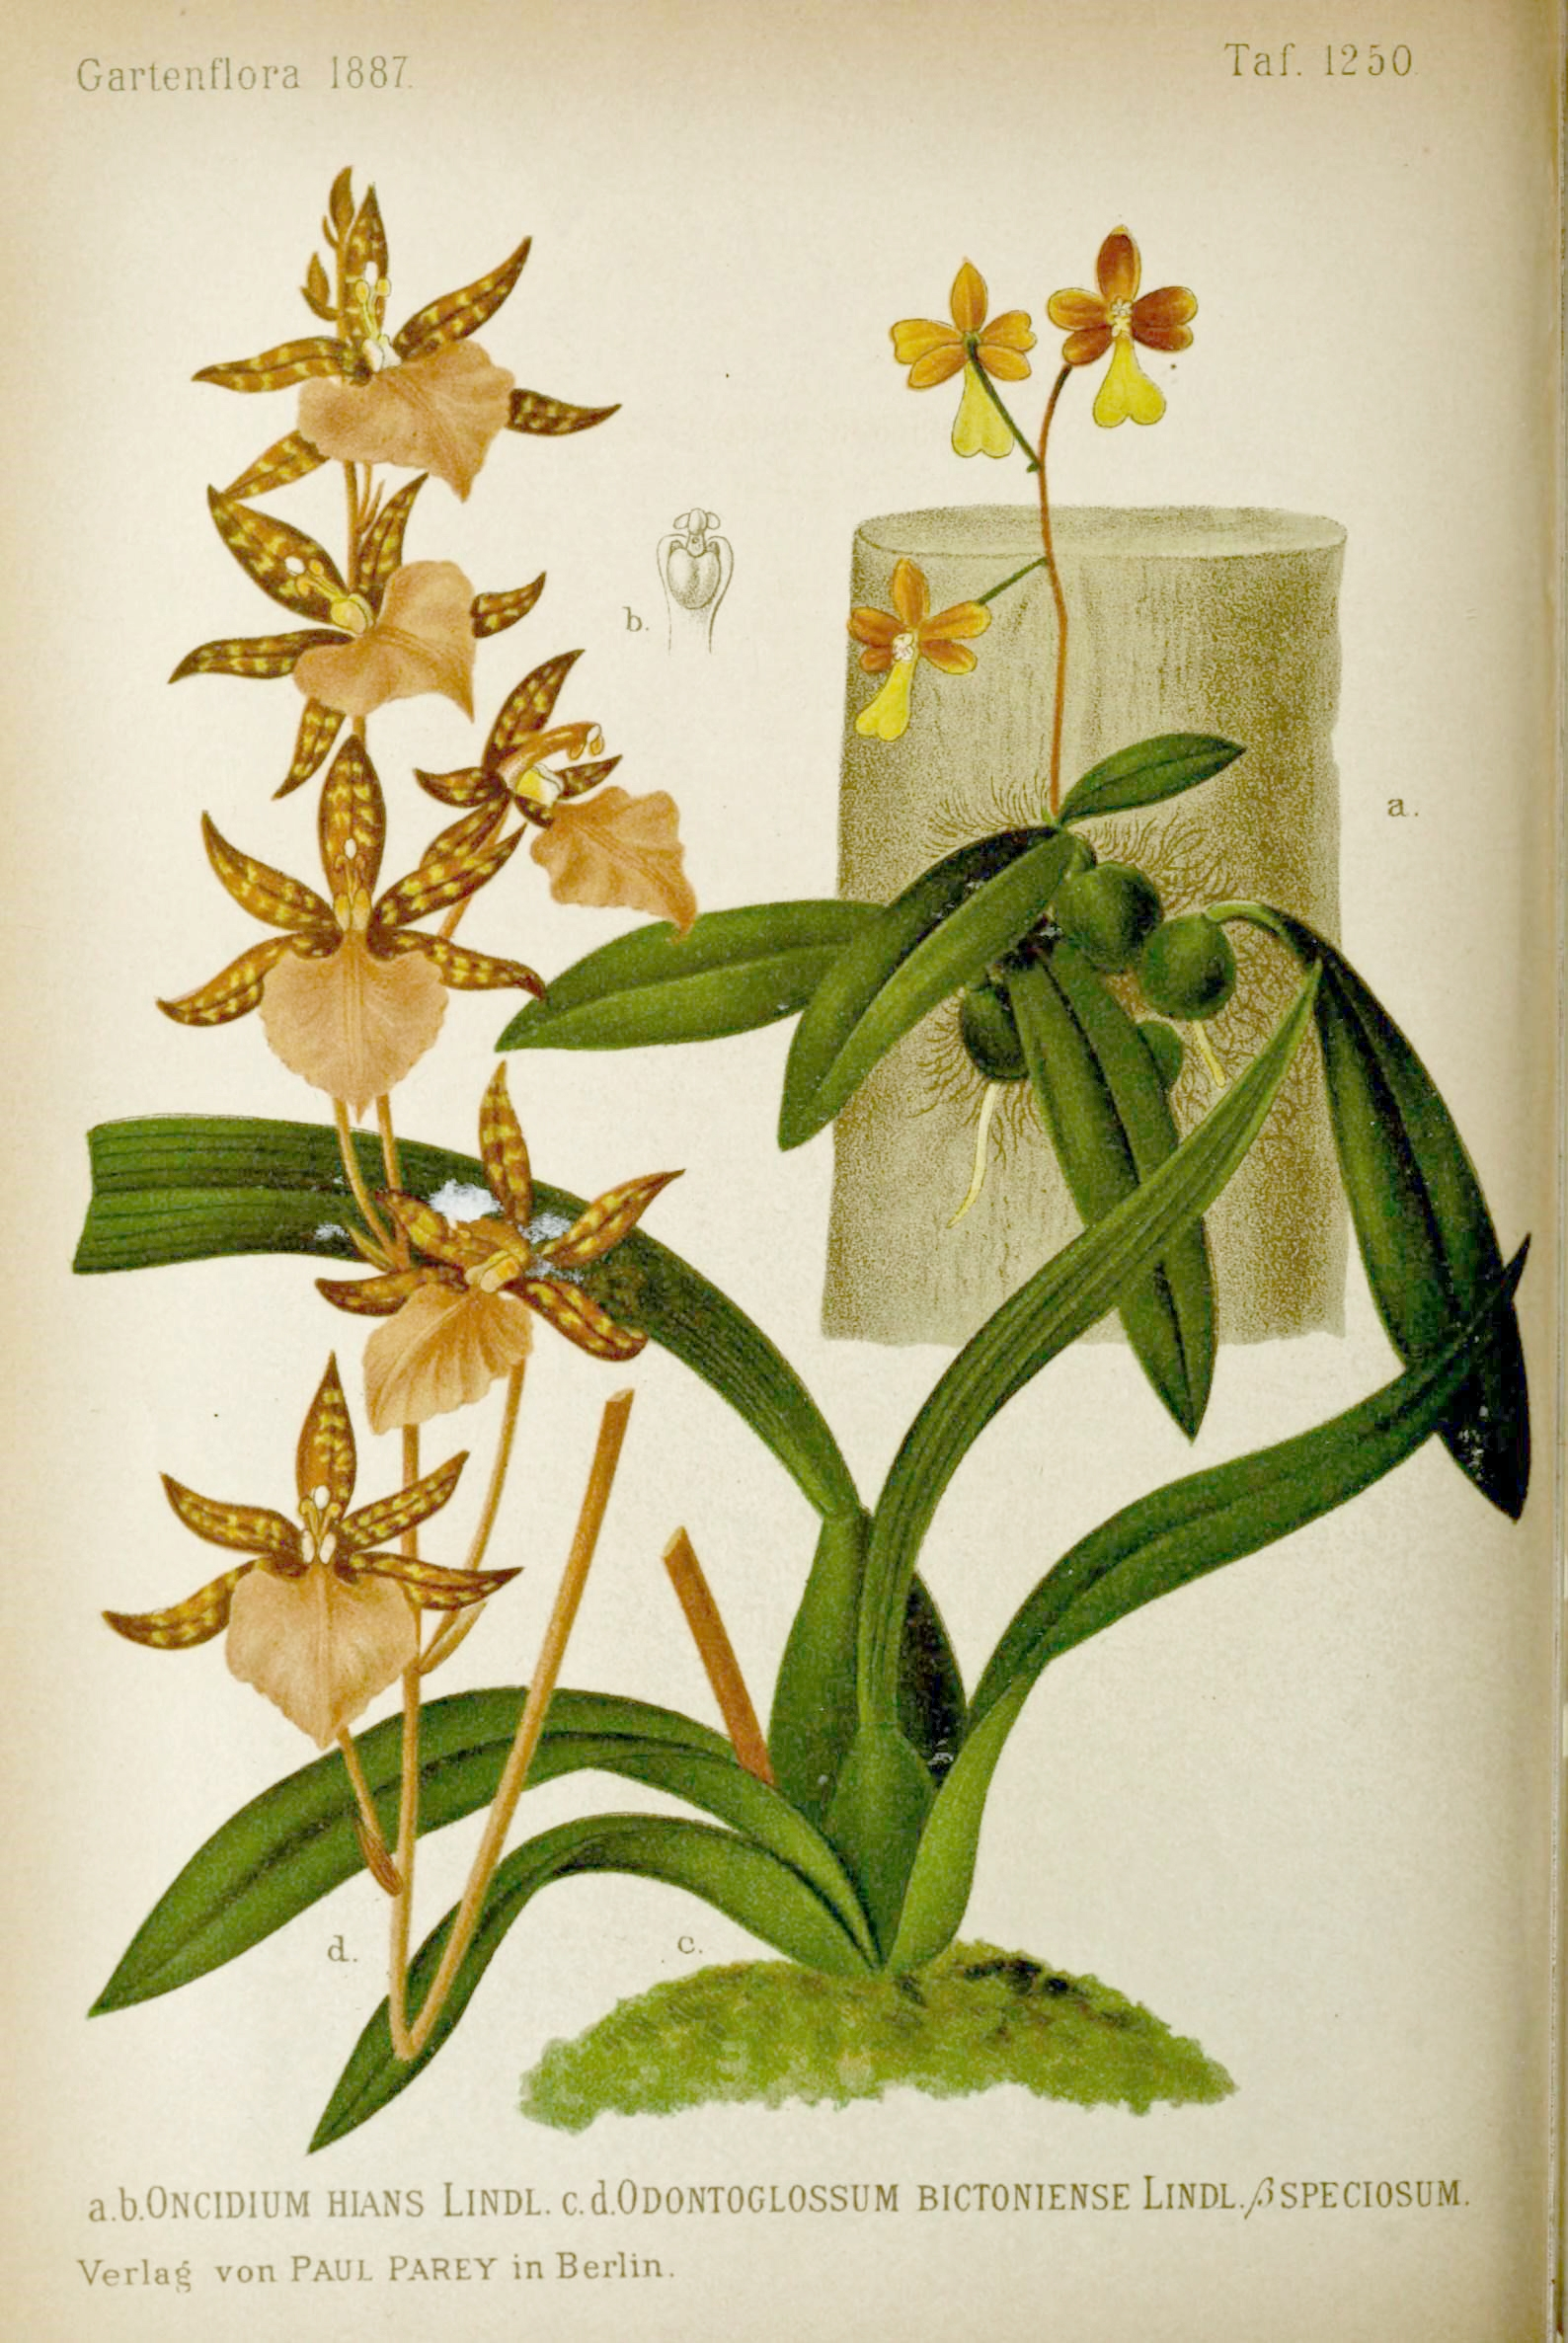 Filegartenflora 15436429264jpg Wikimedia Commons